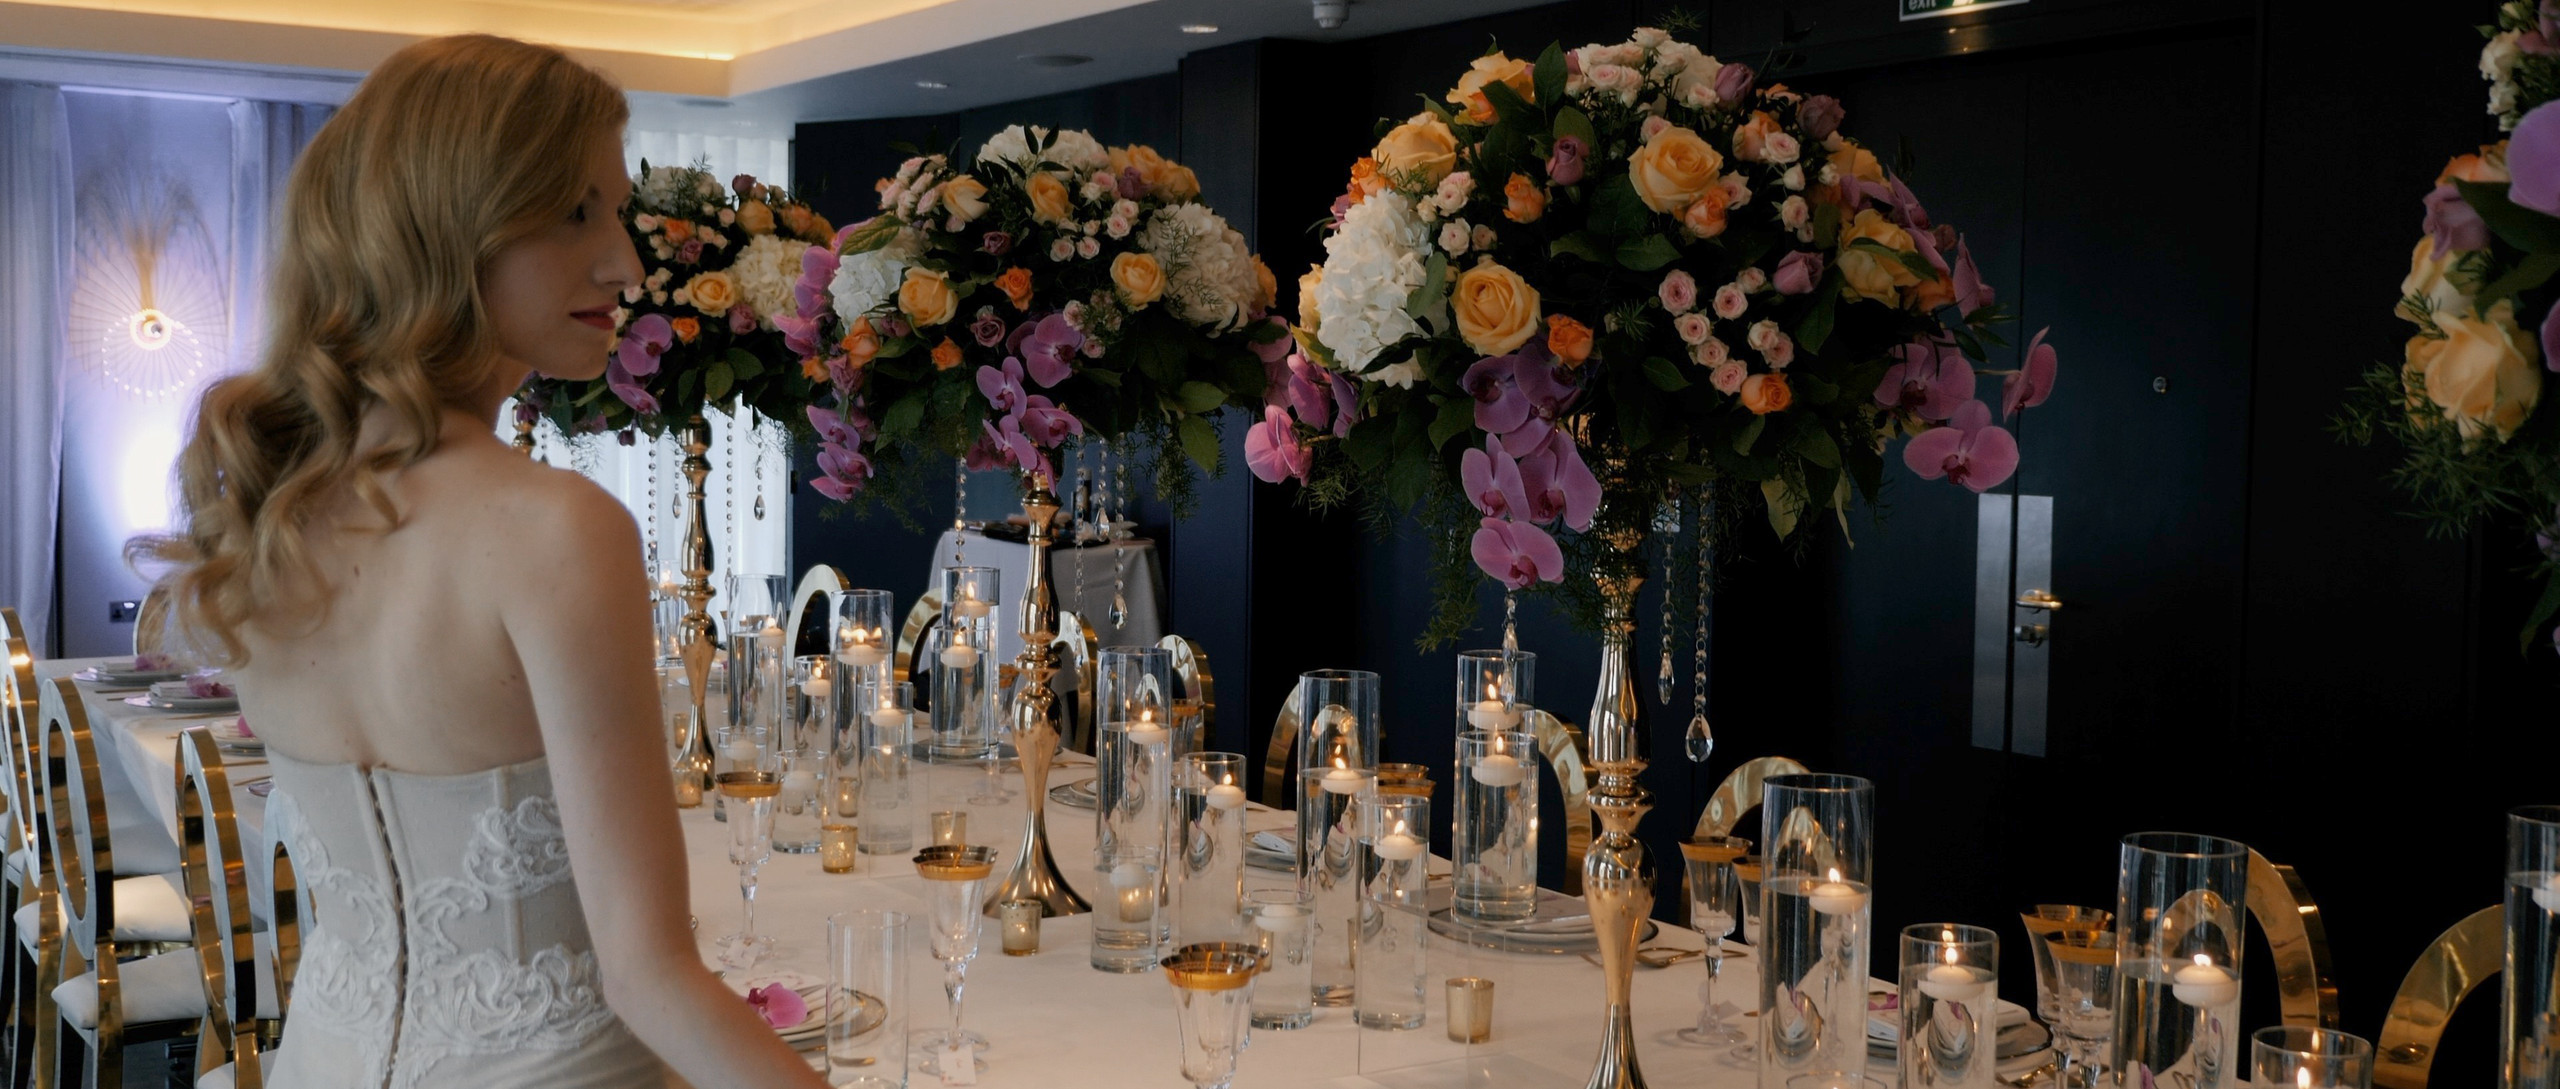 bride checking table london wedding films videographer